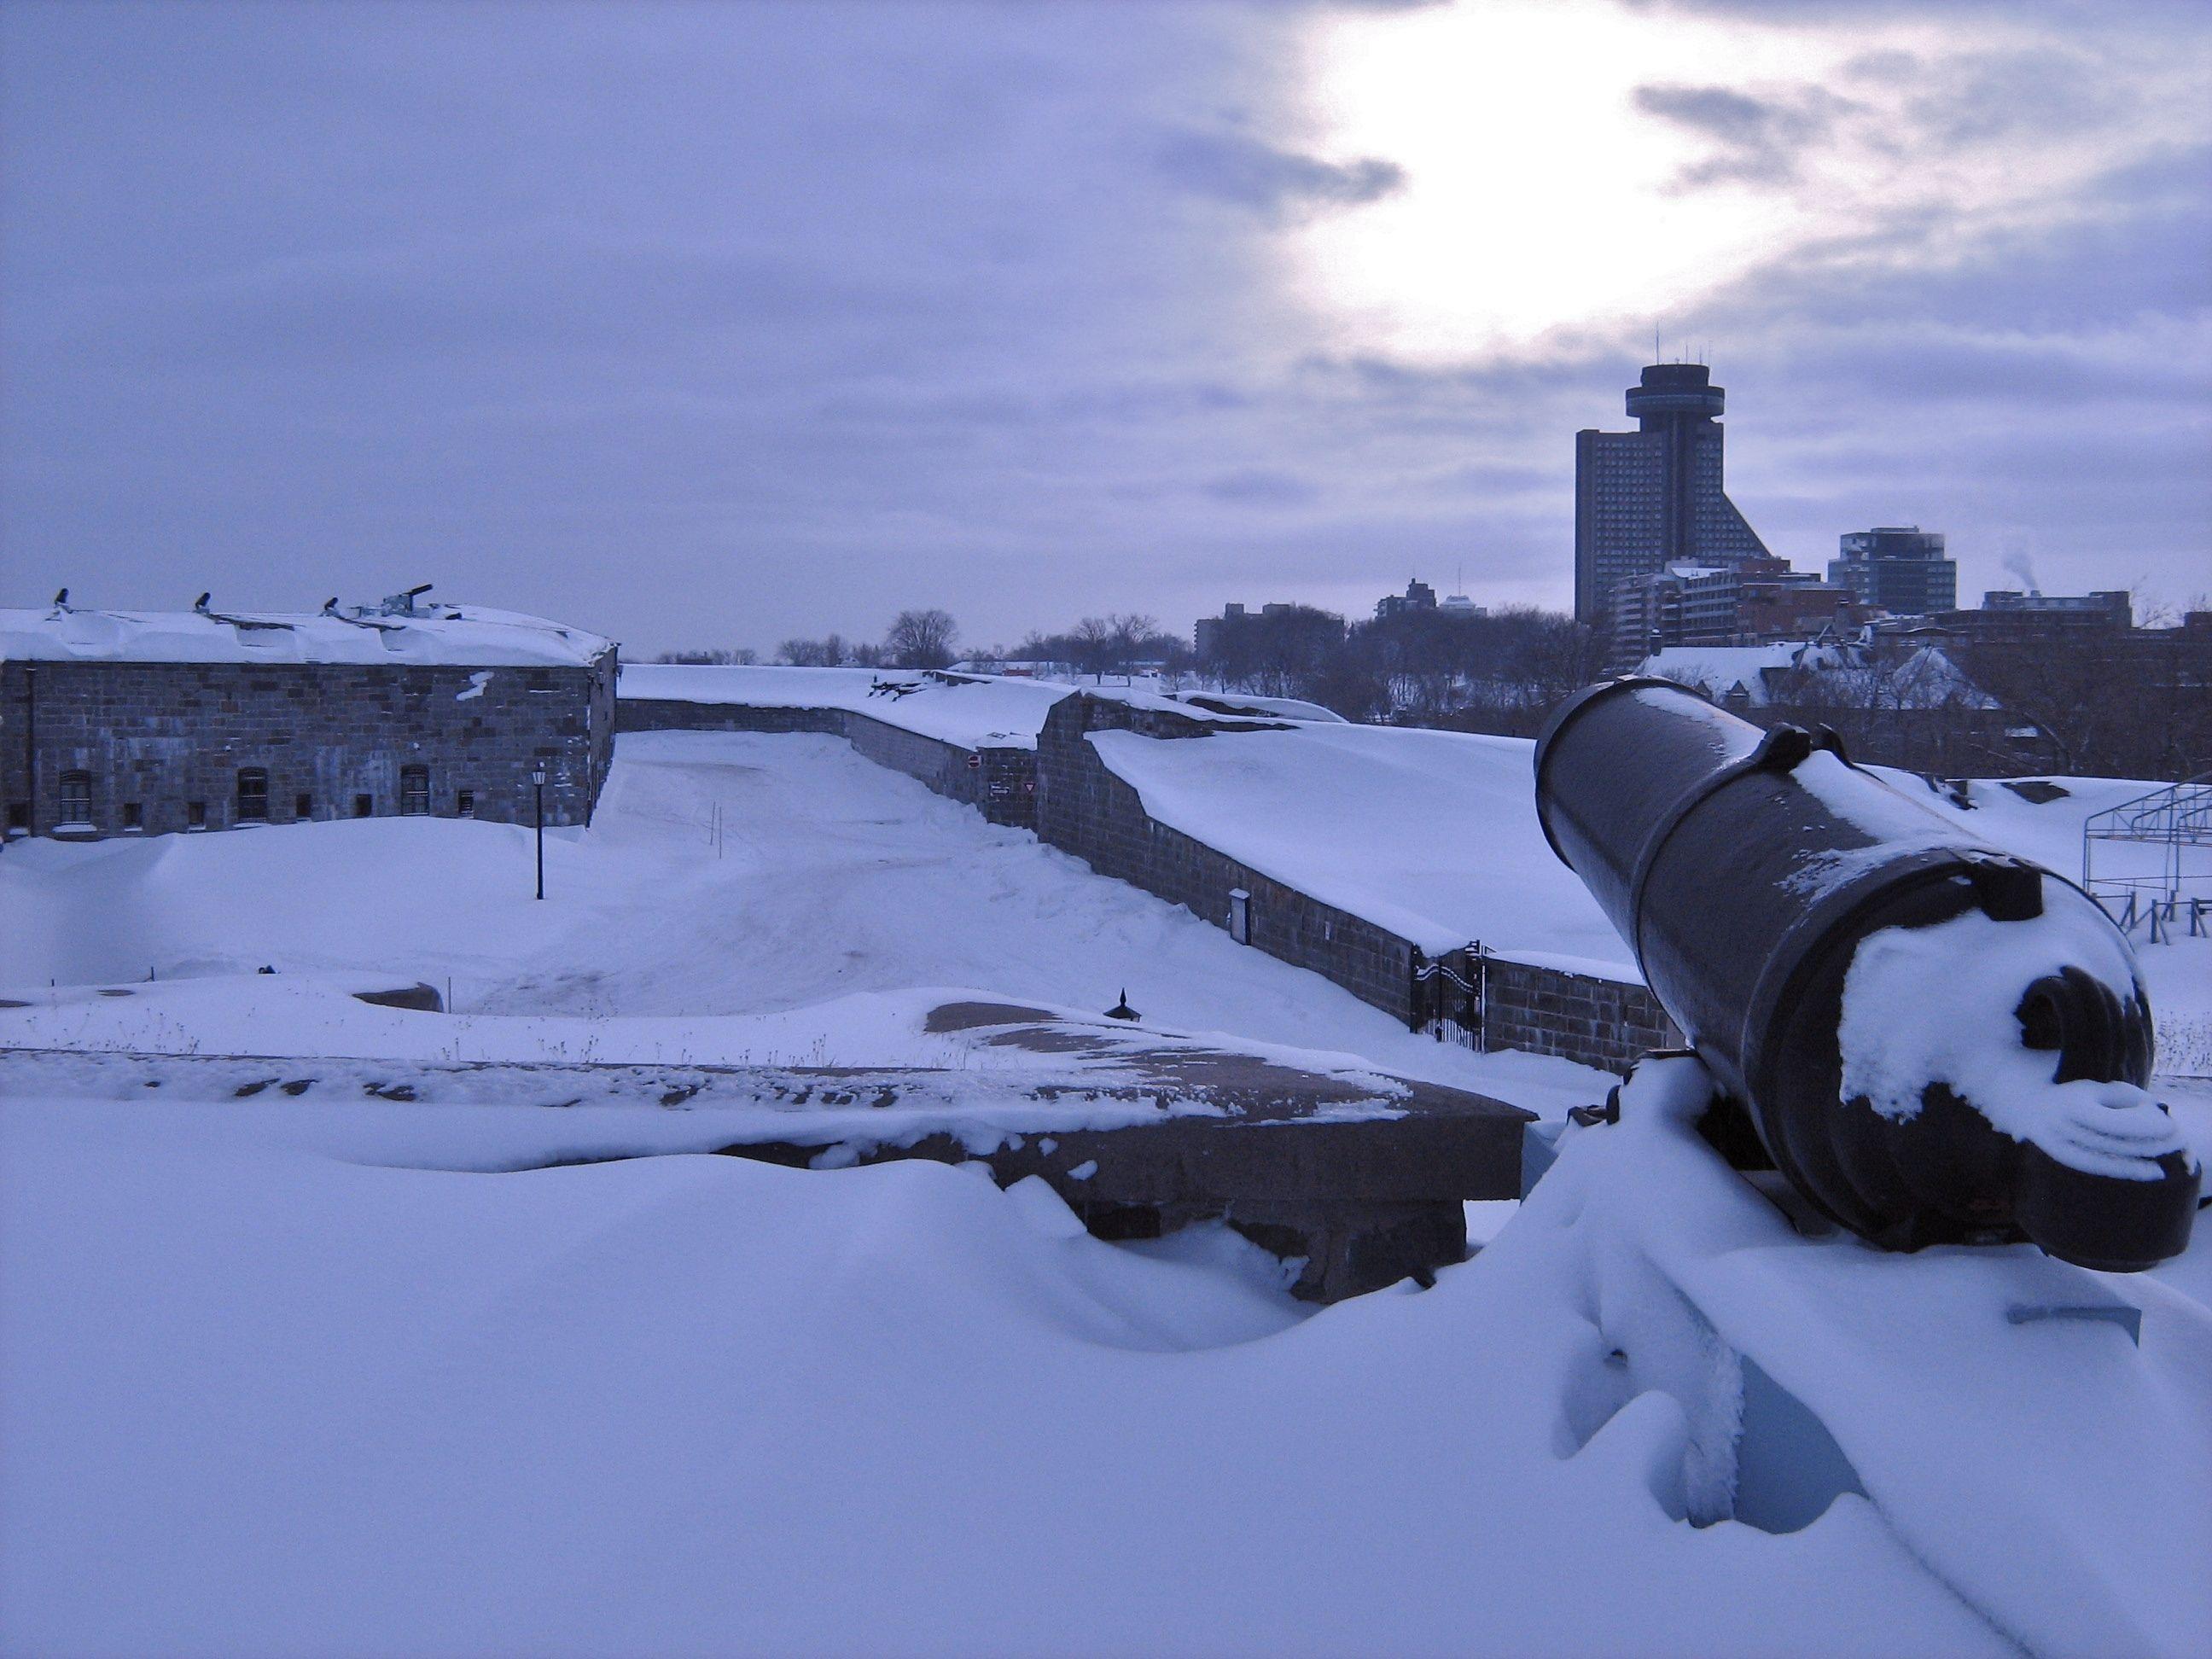 Entr e de la citadelle de qu bec quebec citadelle wint for Winter entrees